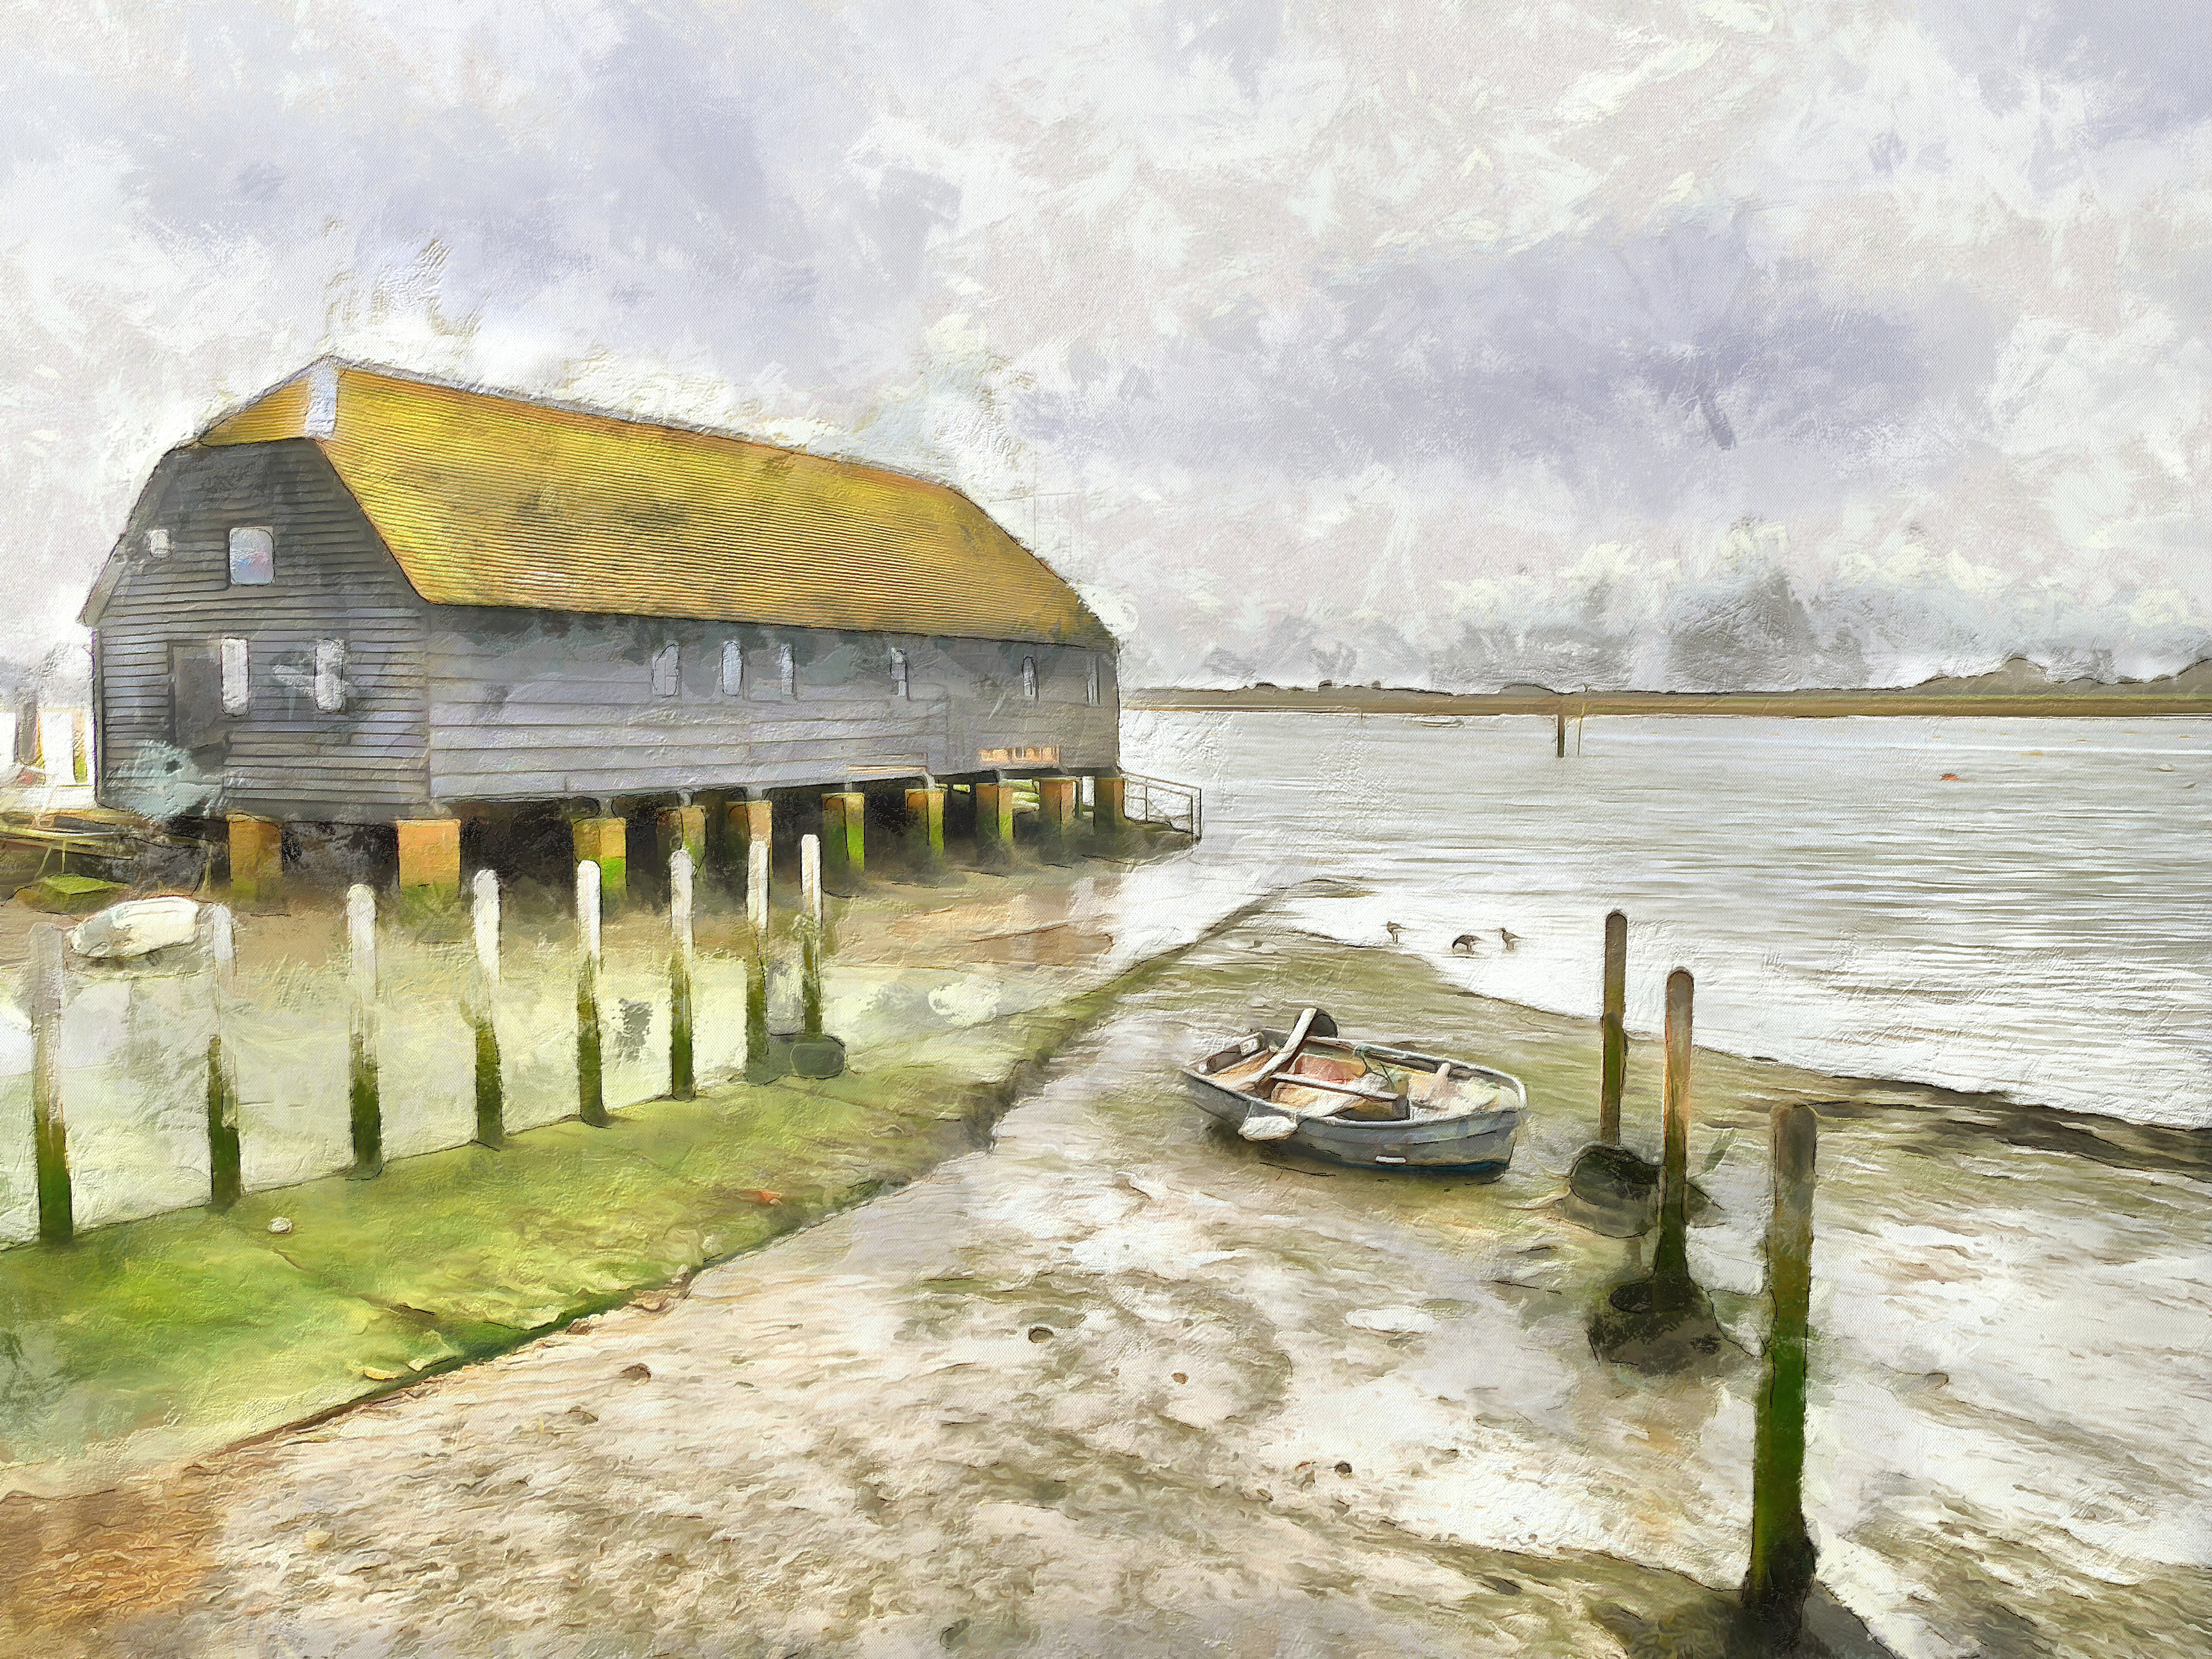 Bosham Quay Raptackle